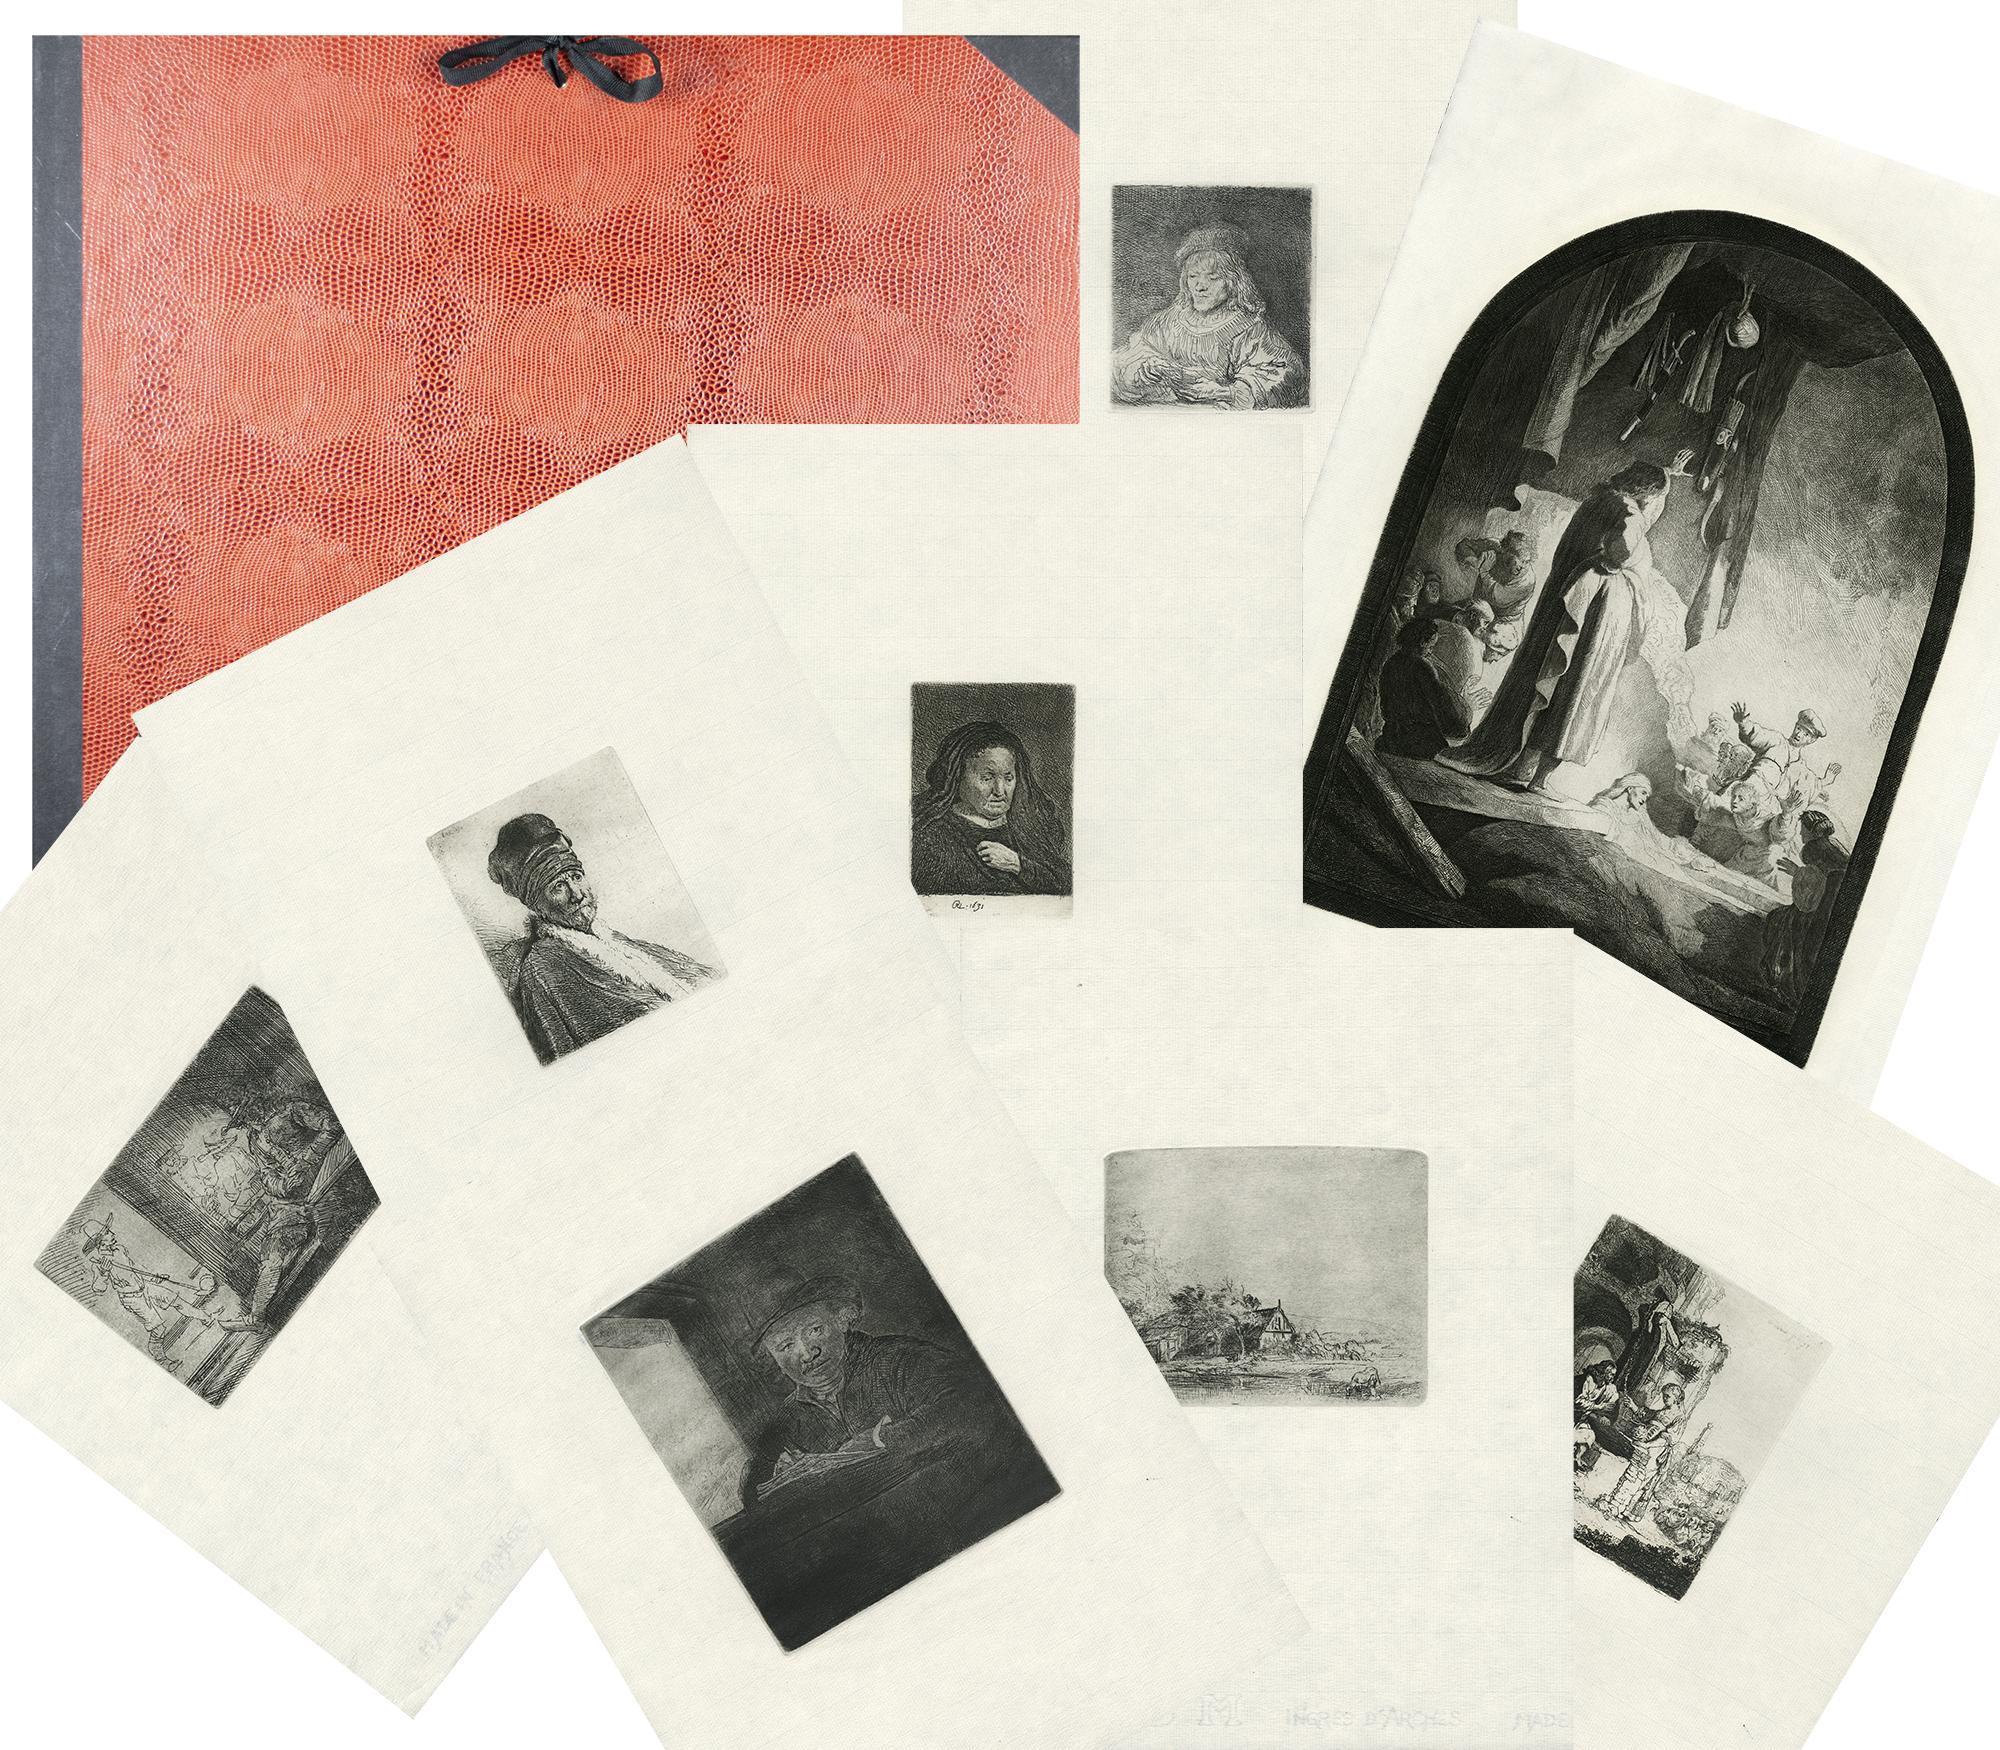 Rembrandt Millennium Edition, 1998 posthumous impressions set of 8